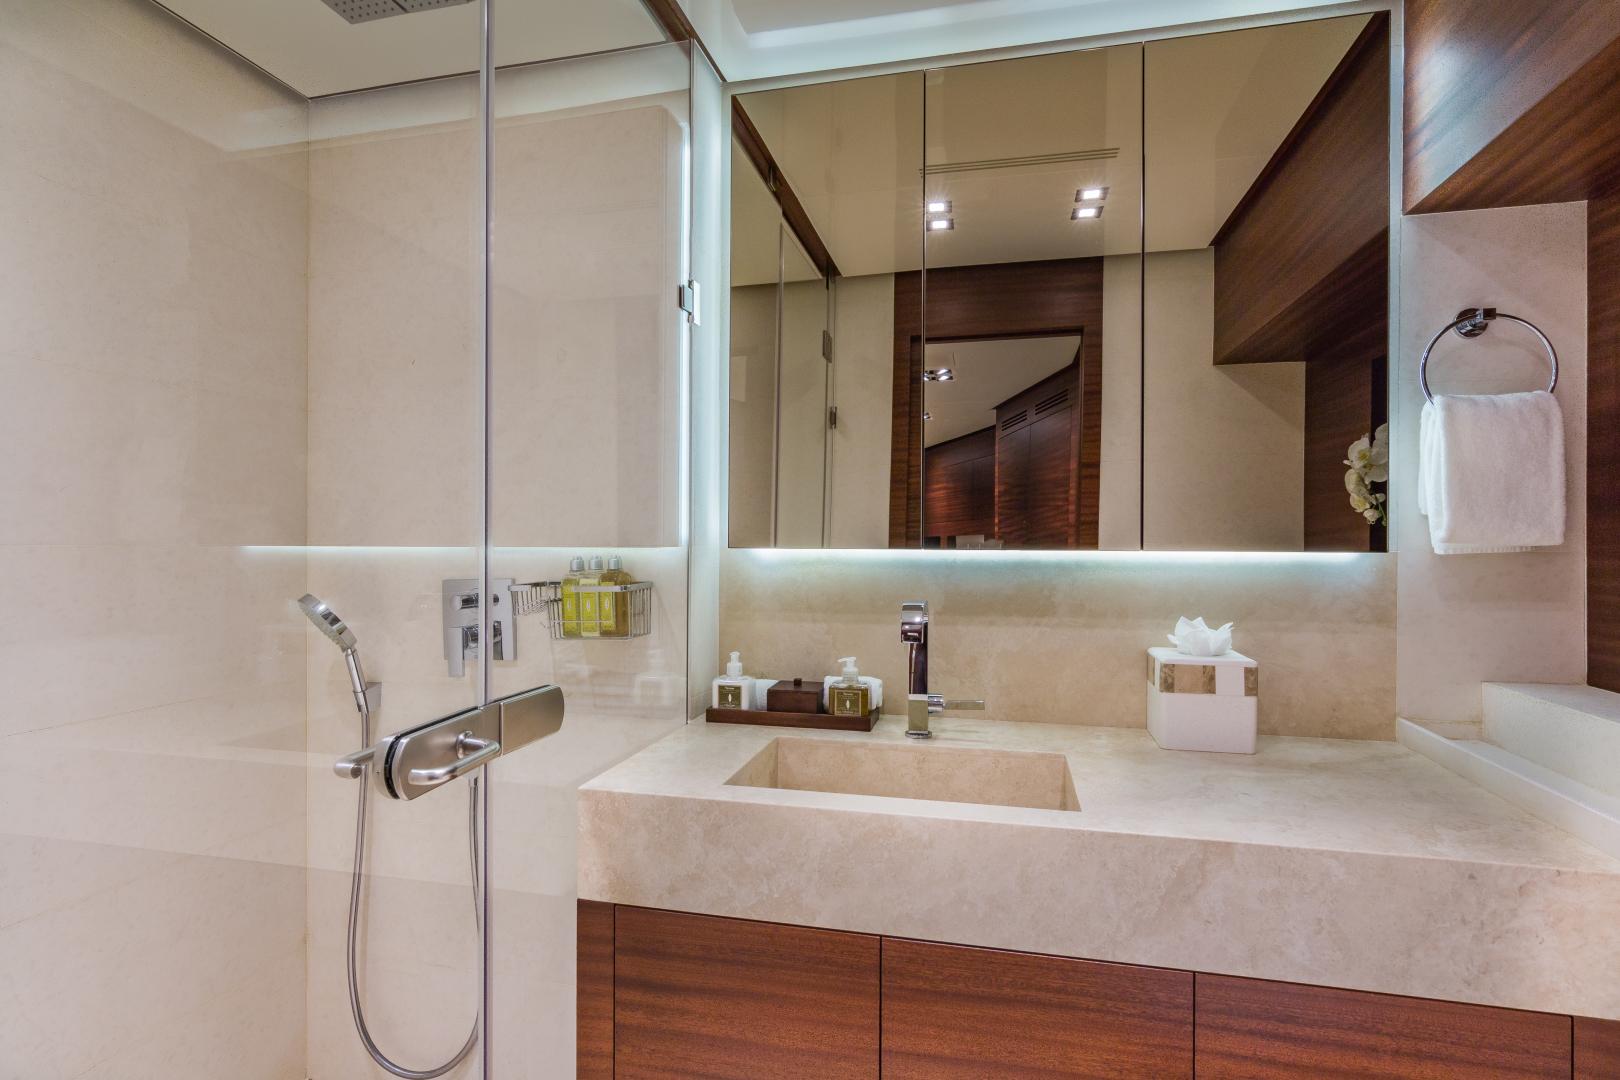 Vicem-Raised Pilot House 2013-MONI FORT LAUDERDALE-Florida-United States-GUEST BATHROOM-1394880 | Thumbnail